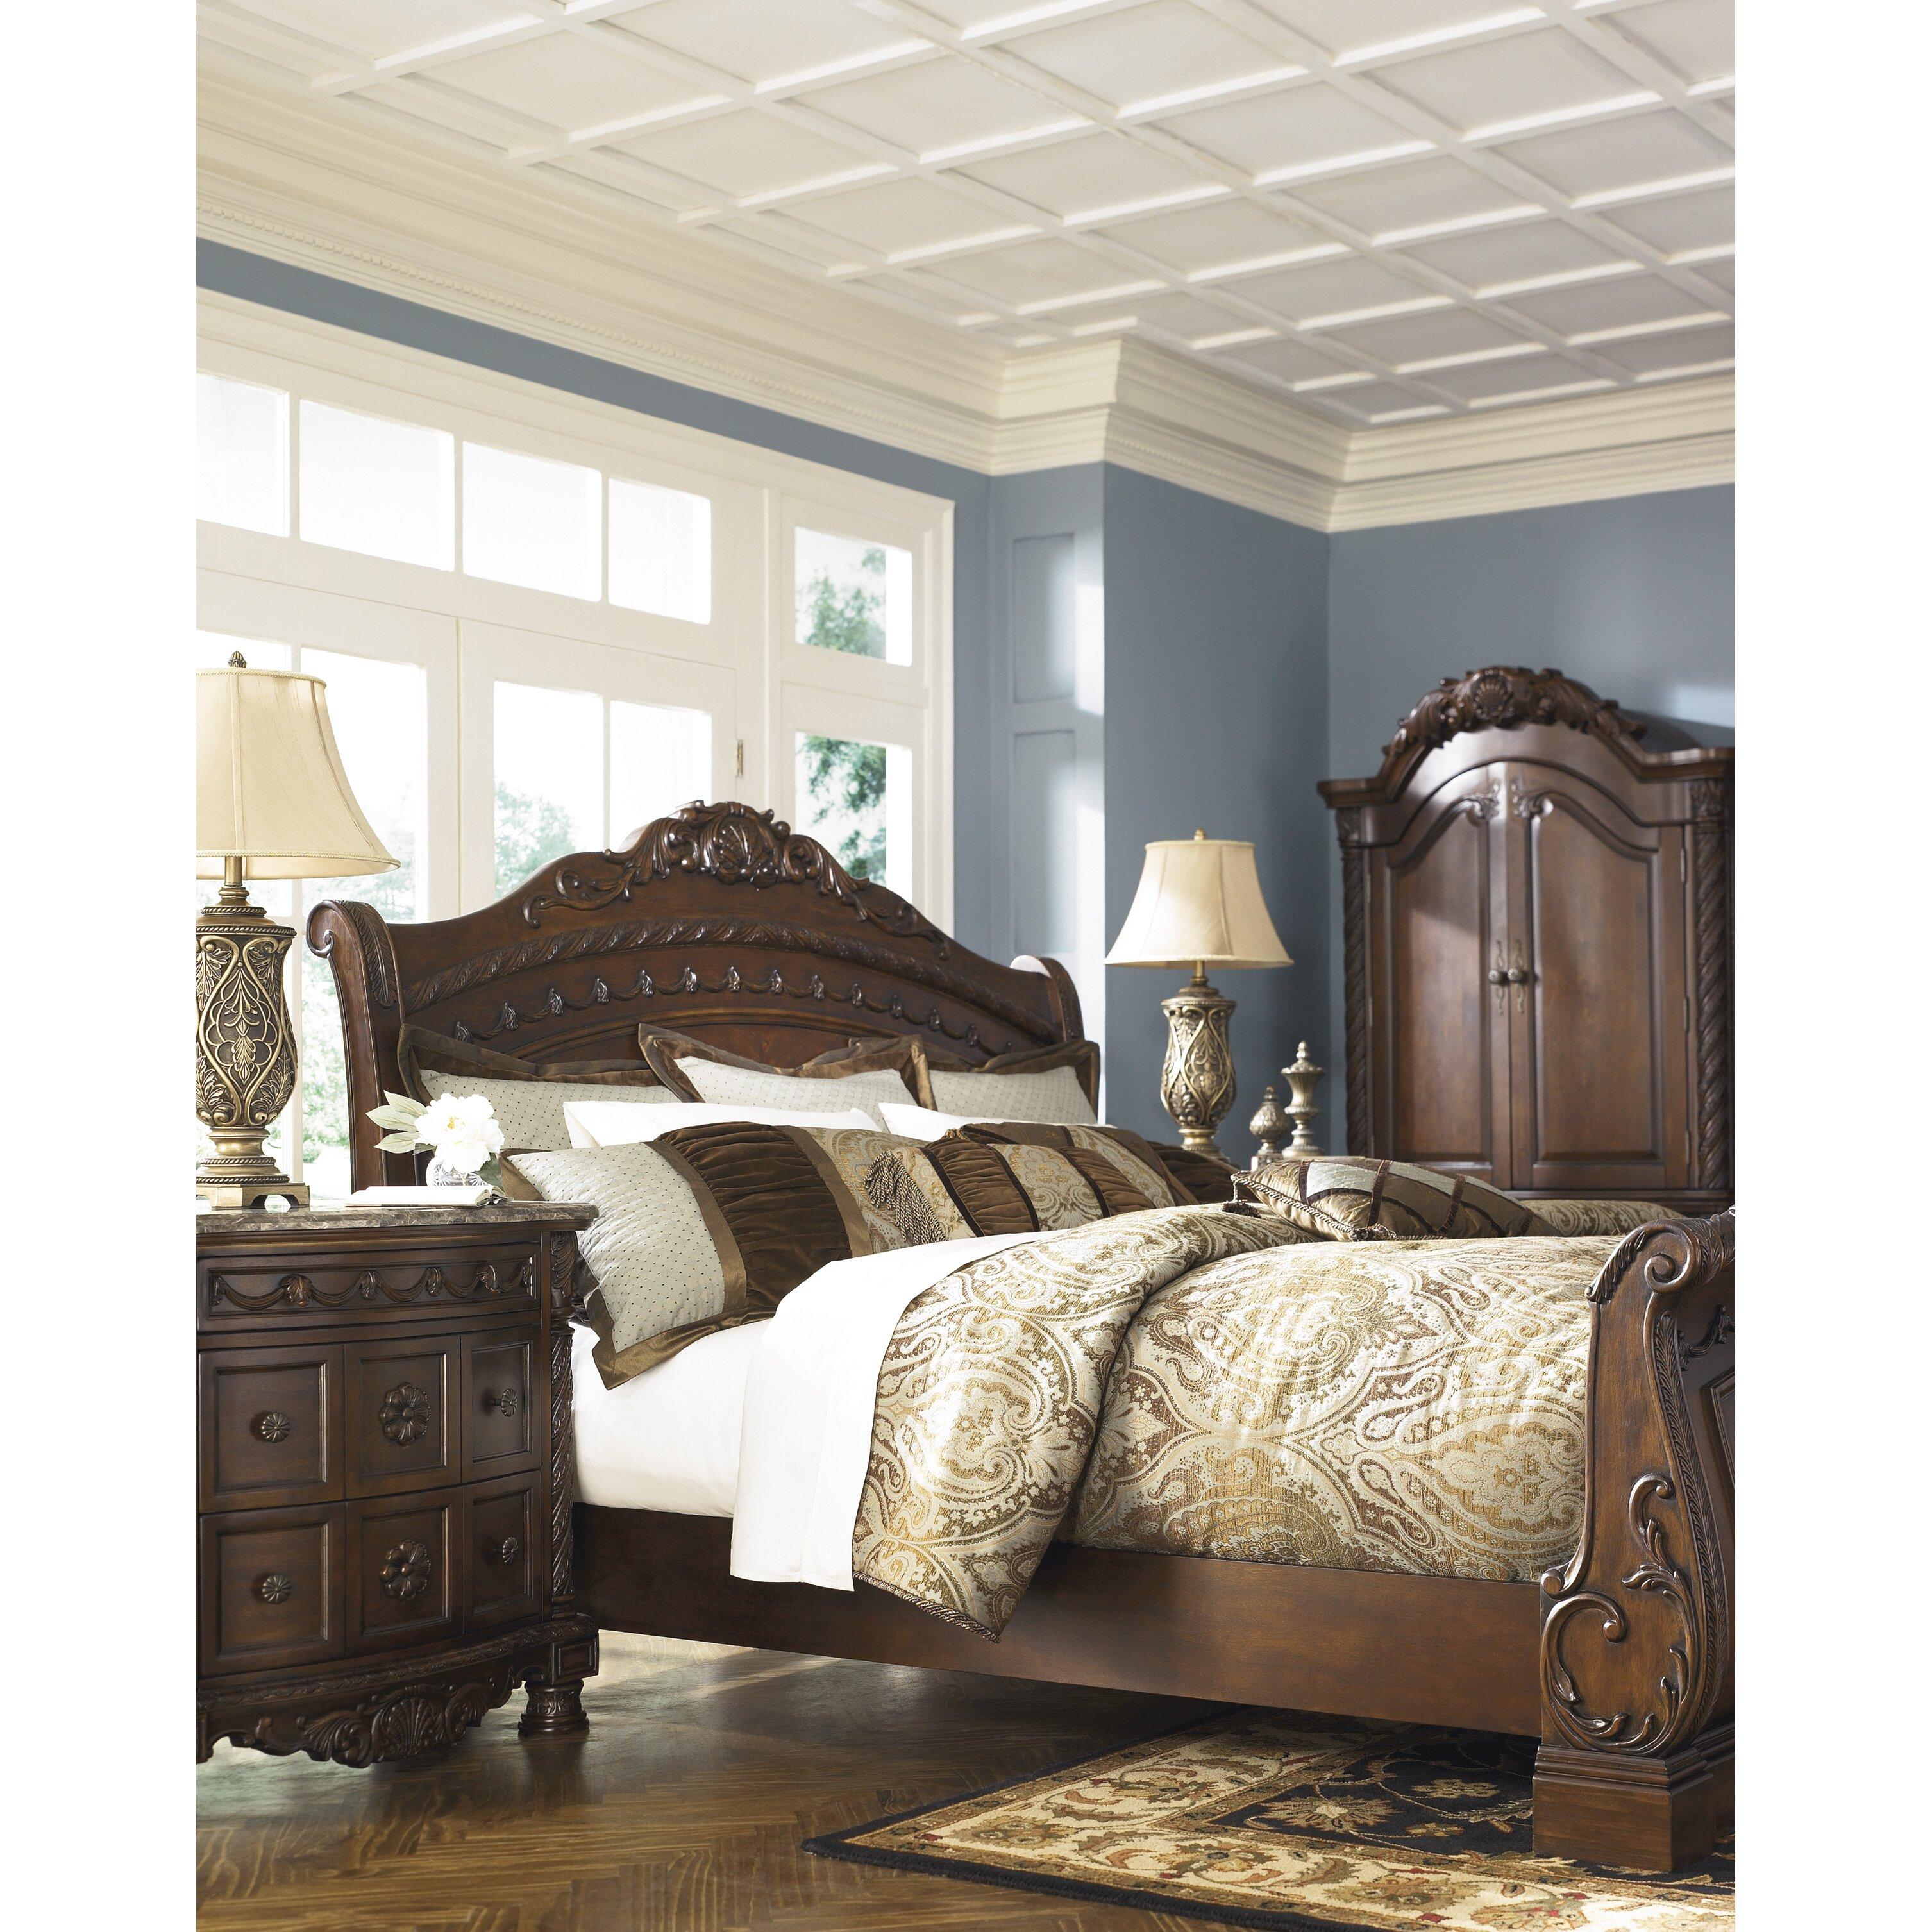 Timberline Sleigh Bedroom Set Signature Design: Signature Design By Ashley North Shore Sleigh Bed